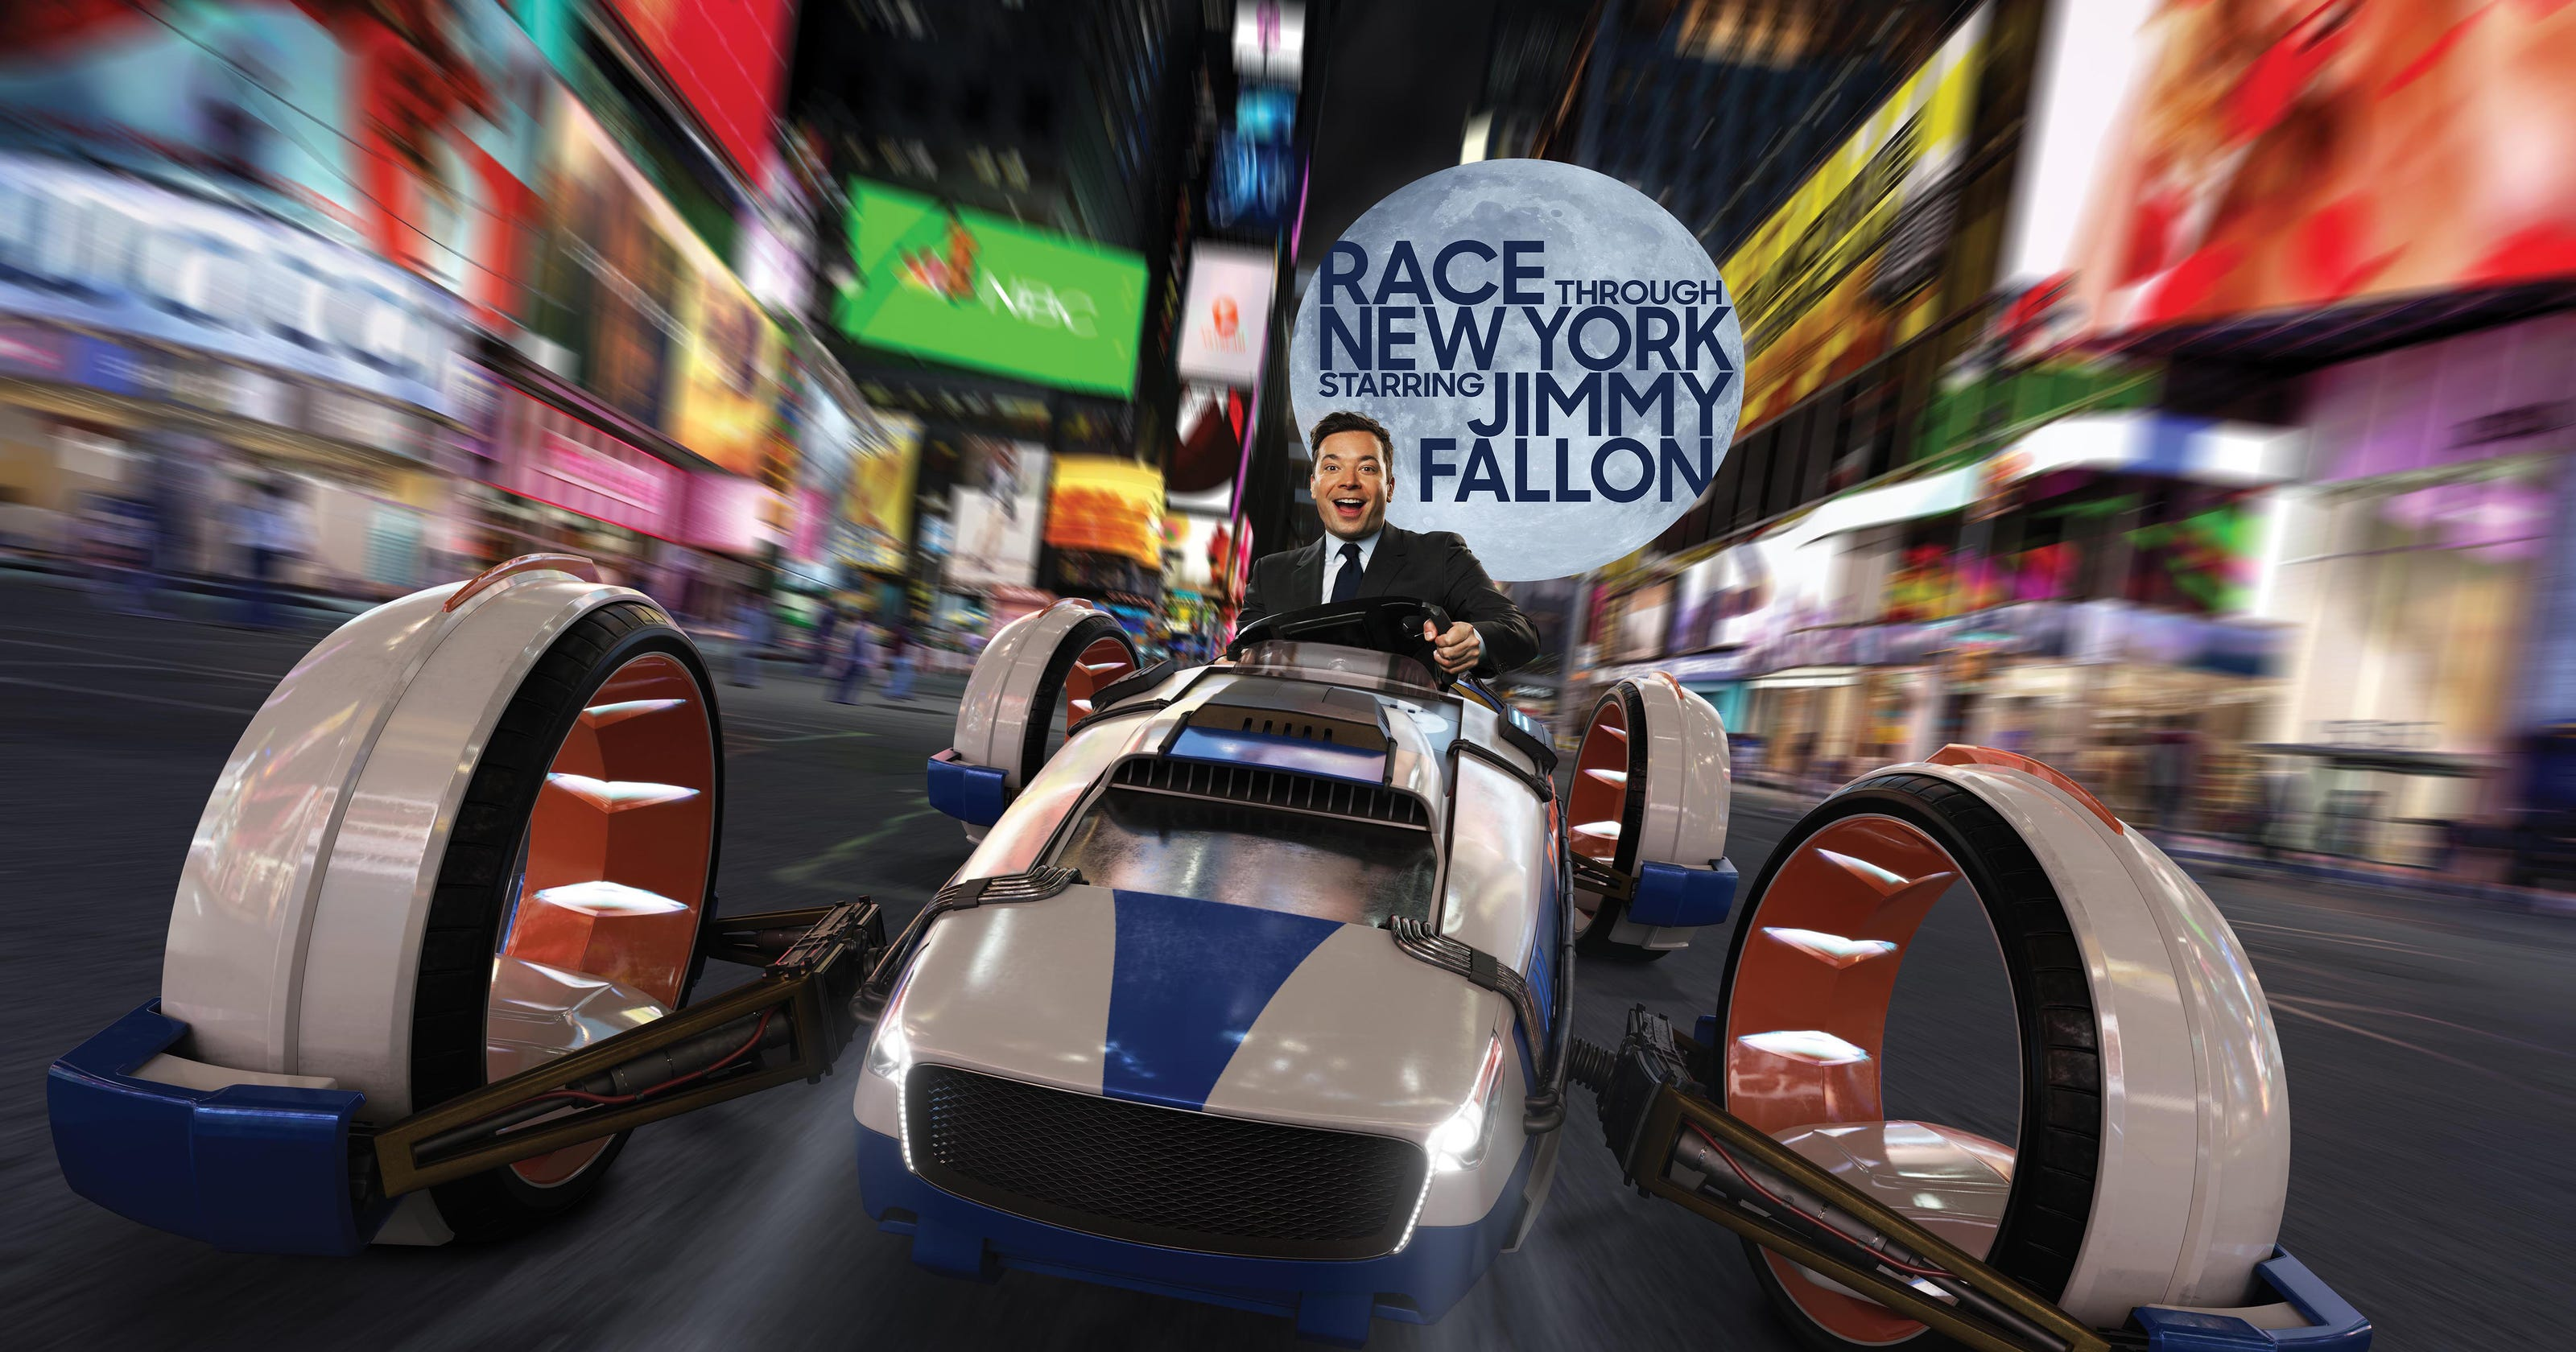 Jimmy Fallon's Race Through New York ride review